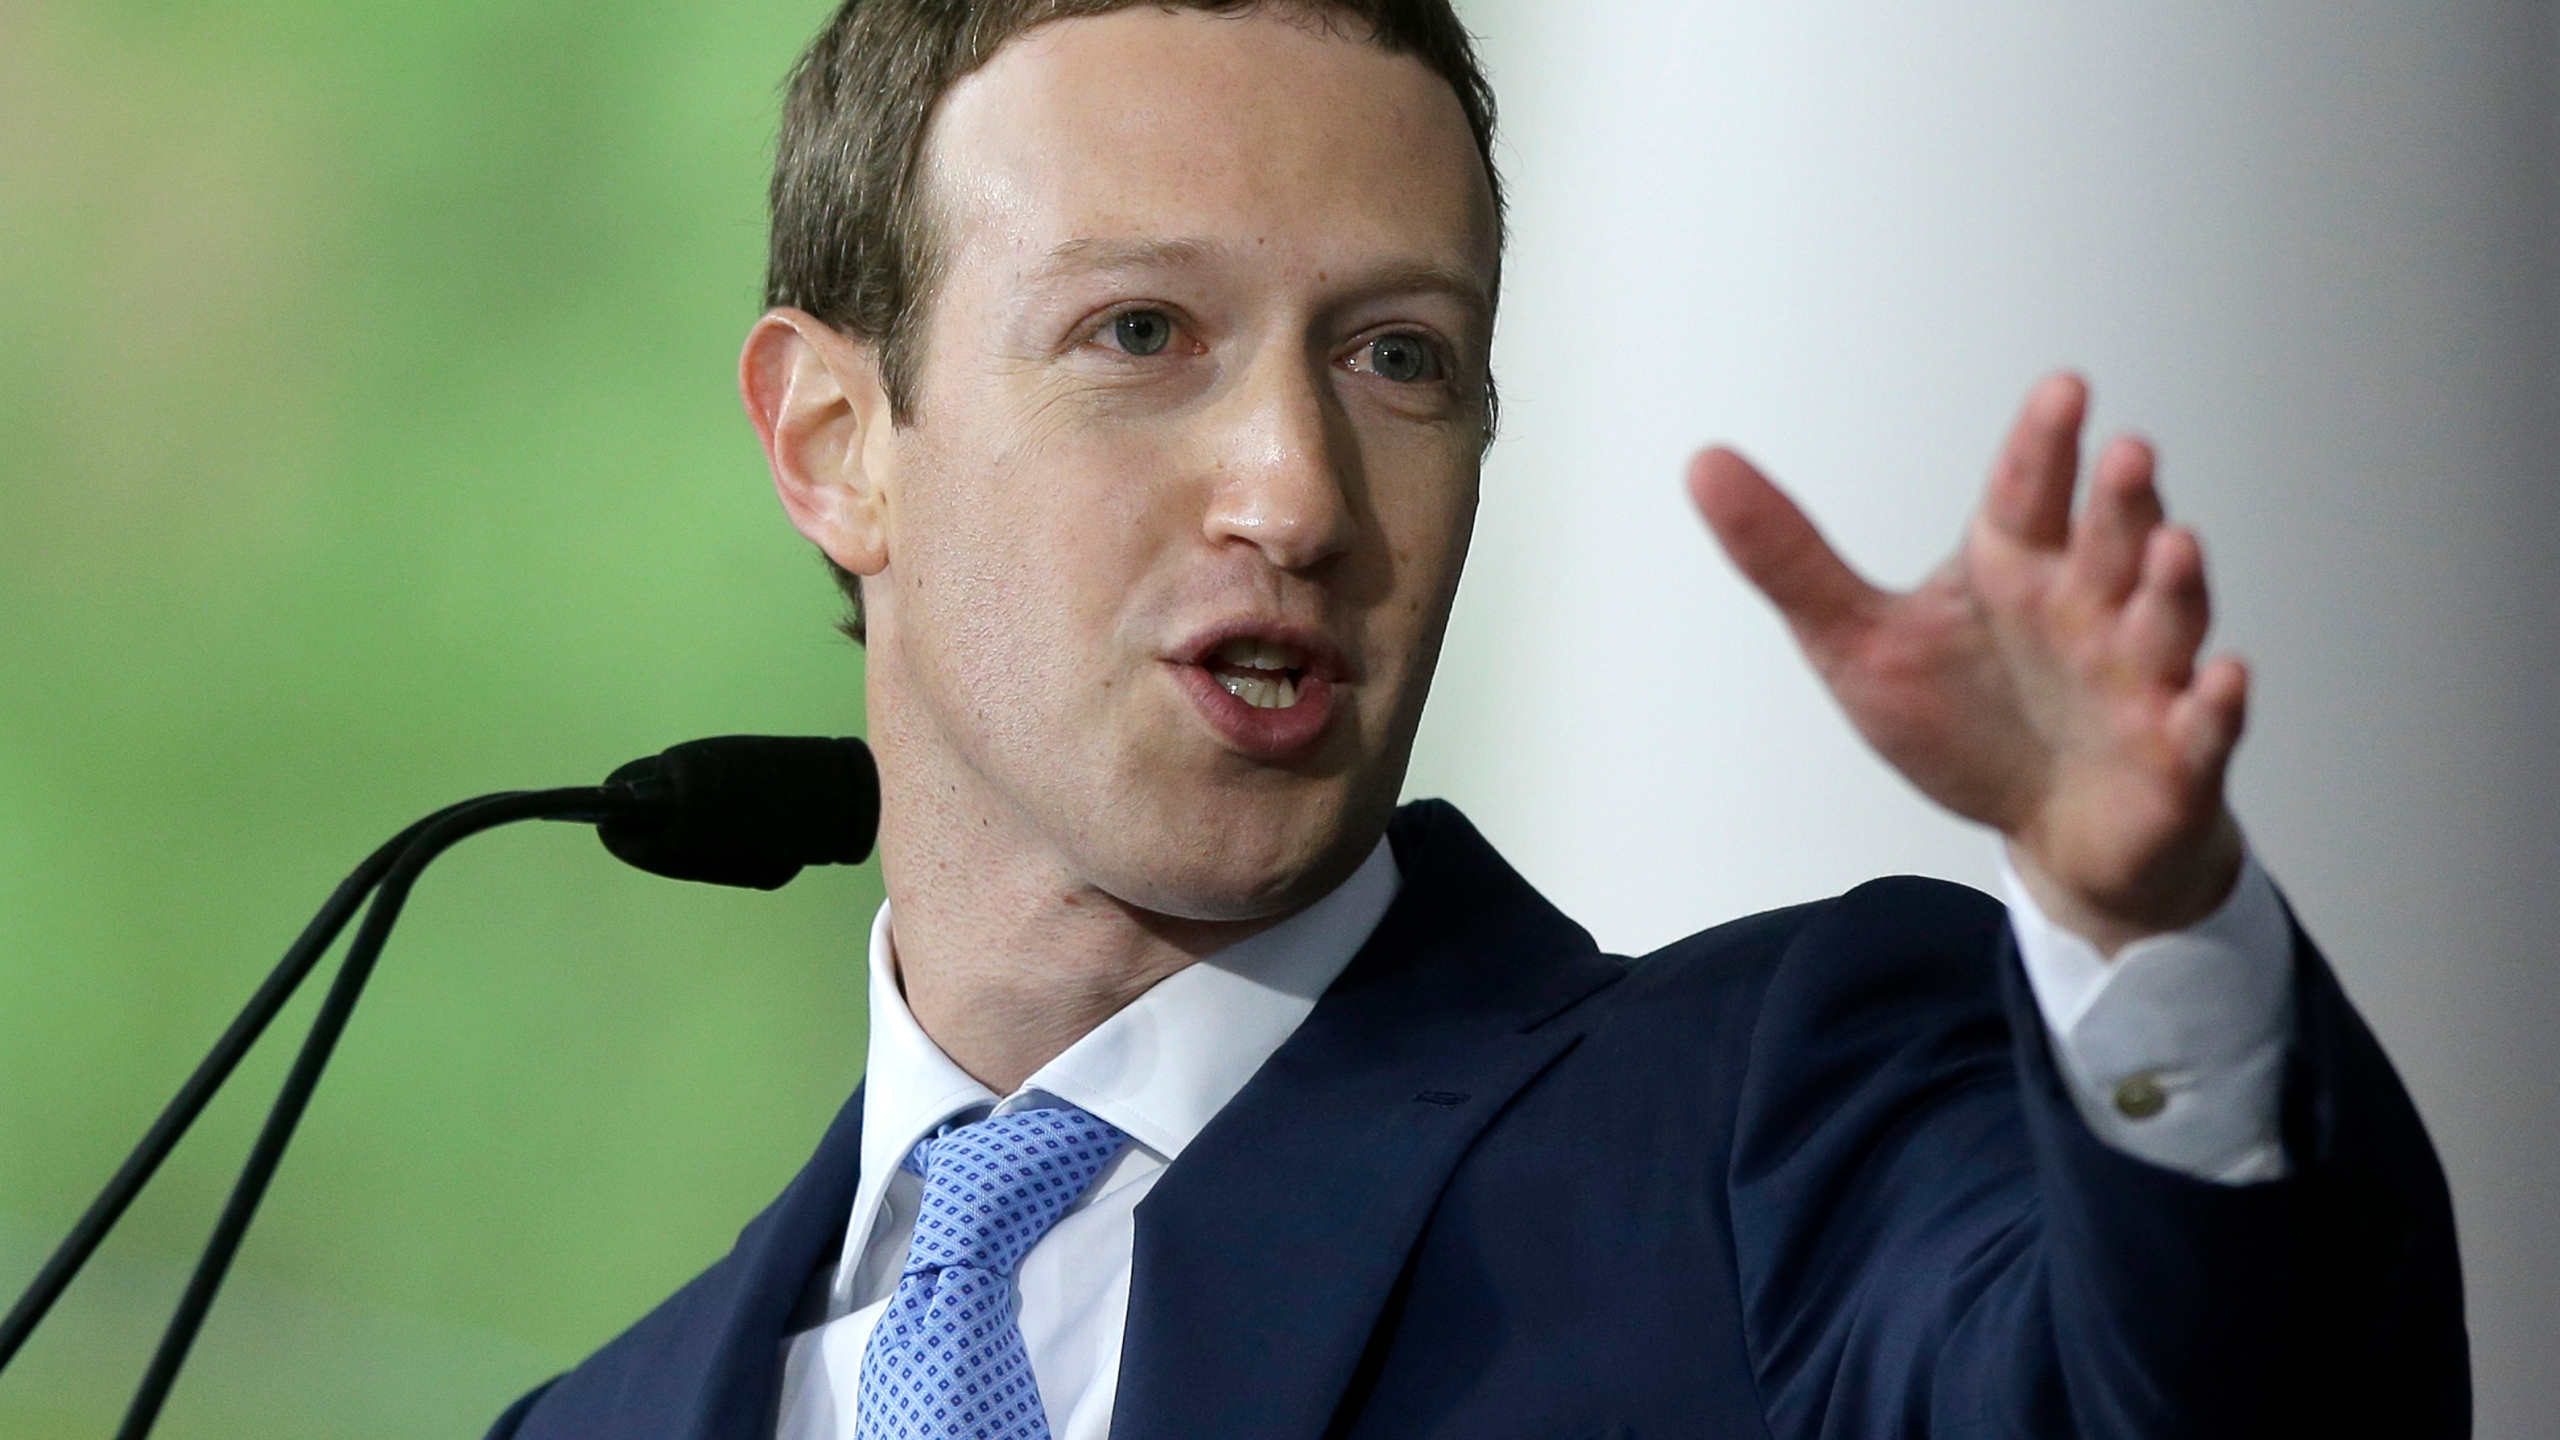 TEC_Facebook_Zuckerberg_Congress_48049-159532.jpg88076174